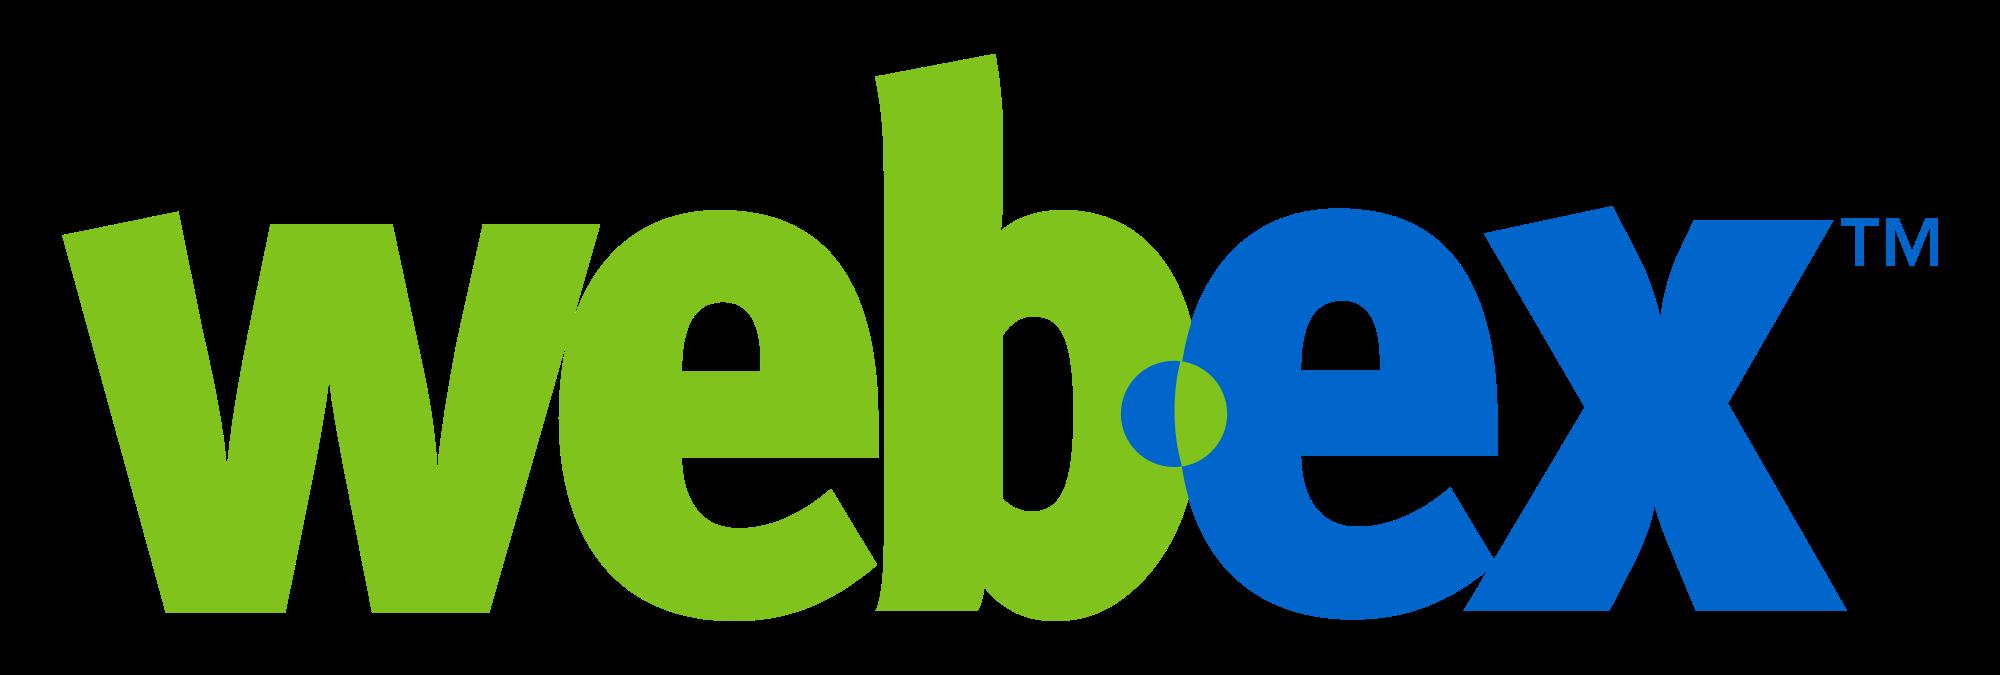 WebEx_logo.png